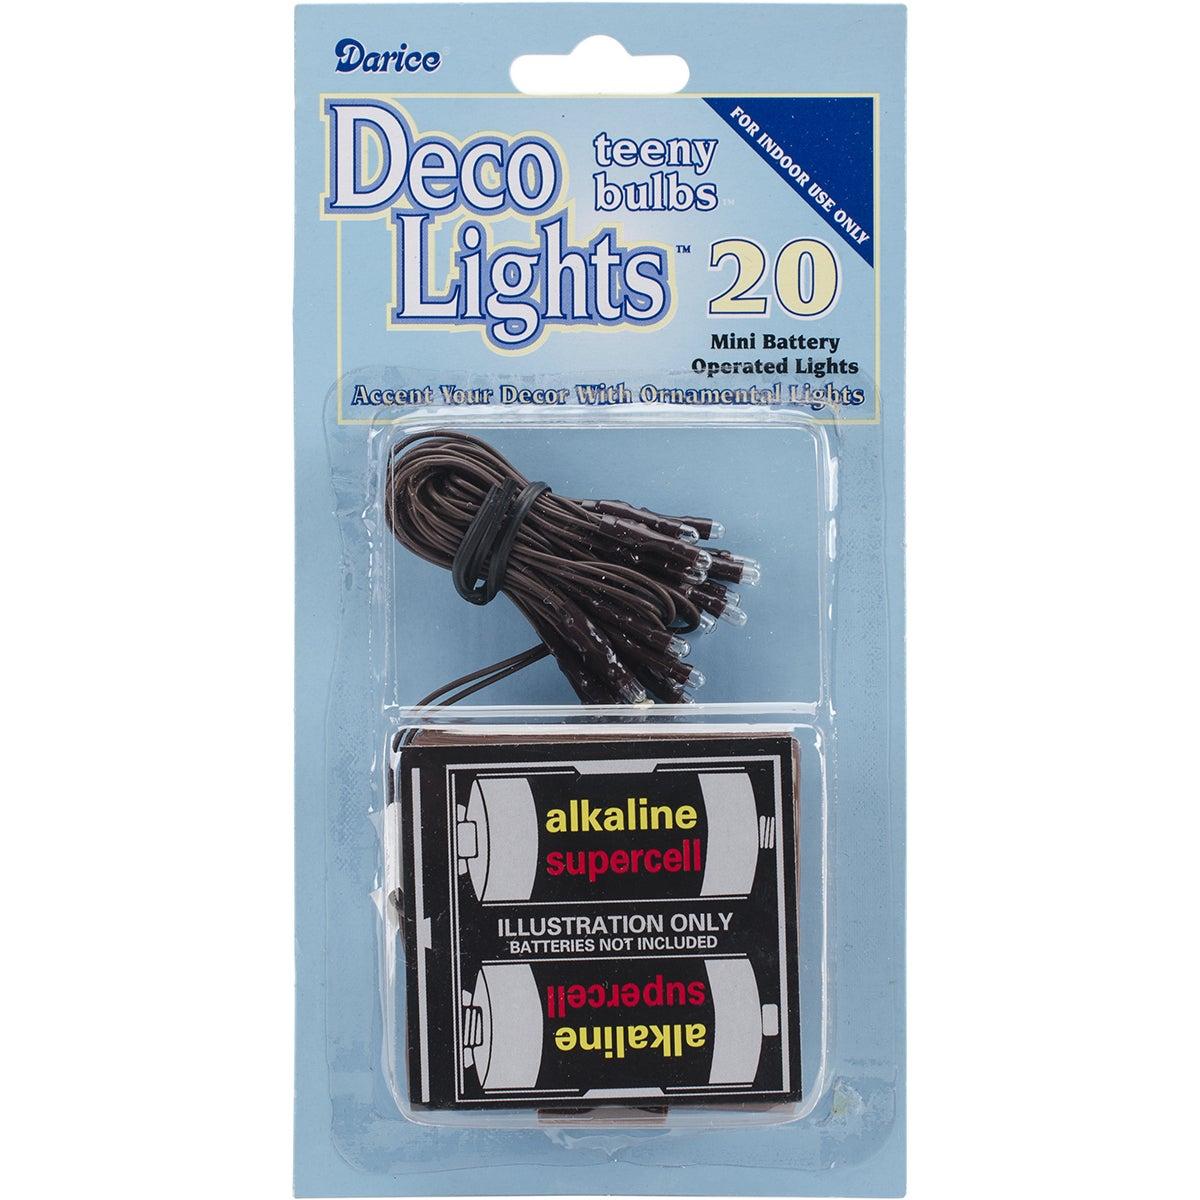 DARICE Deco Lights Battery Operated Teeny Bulbs 20 BulbsW...